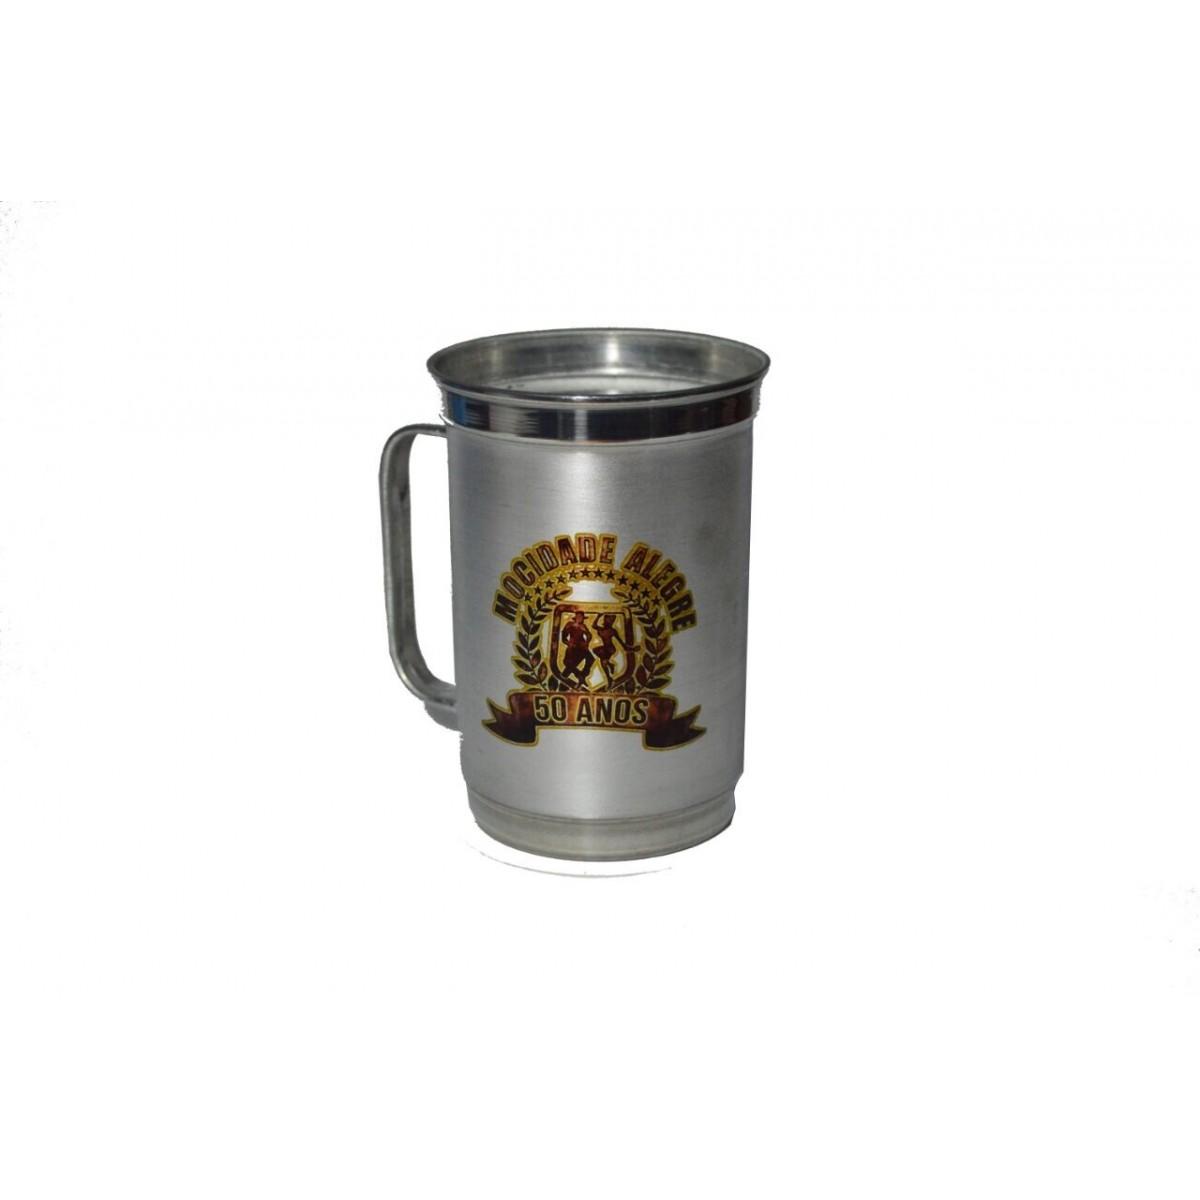 Caneca de alumínio - 500 ml   - Mocidade Alegre